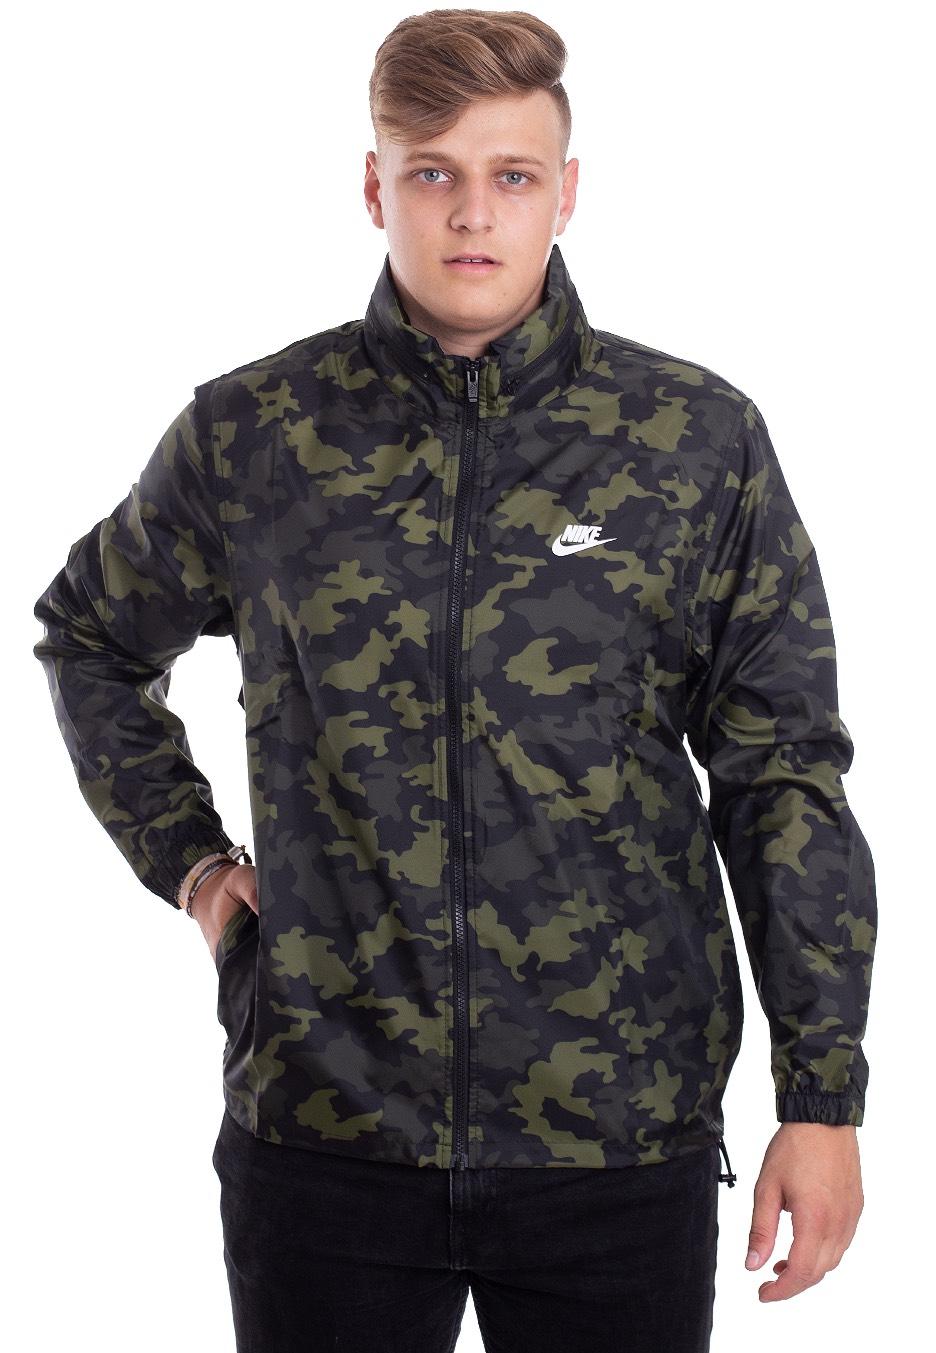 Nike NSW CE HD Camo LG GreenSMT White Jacket